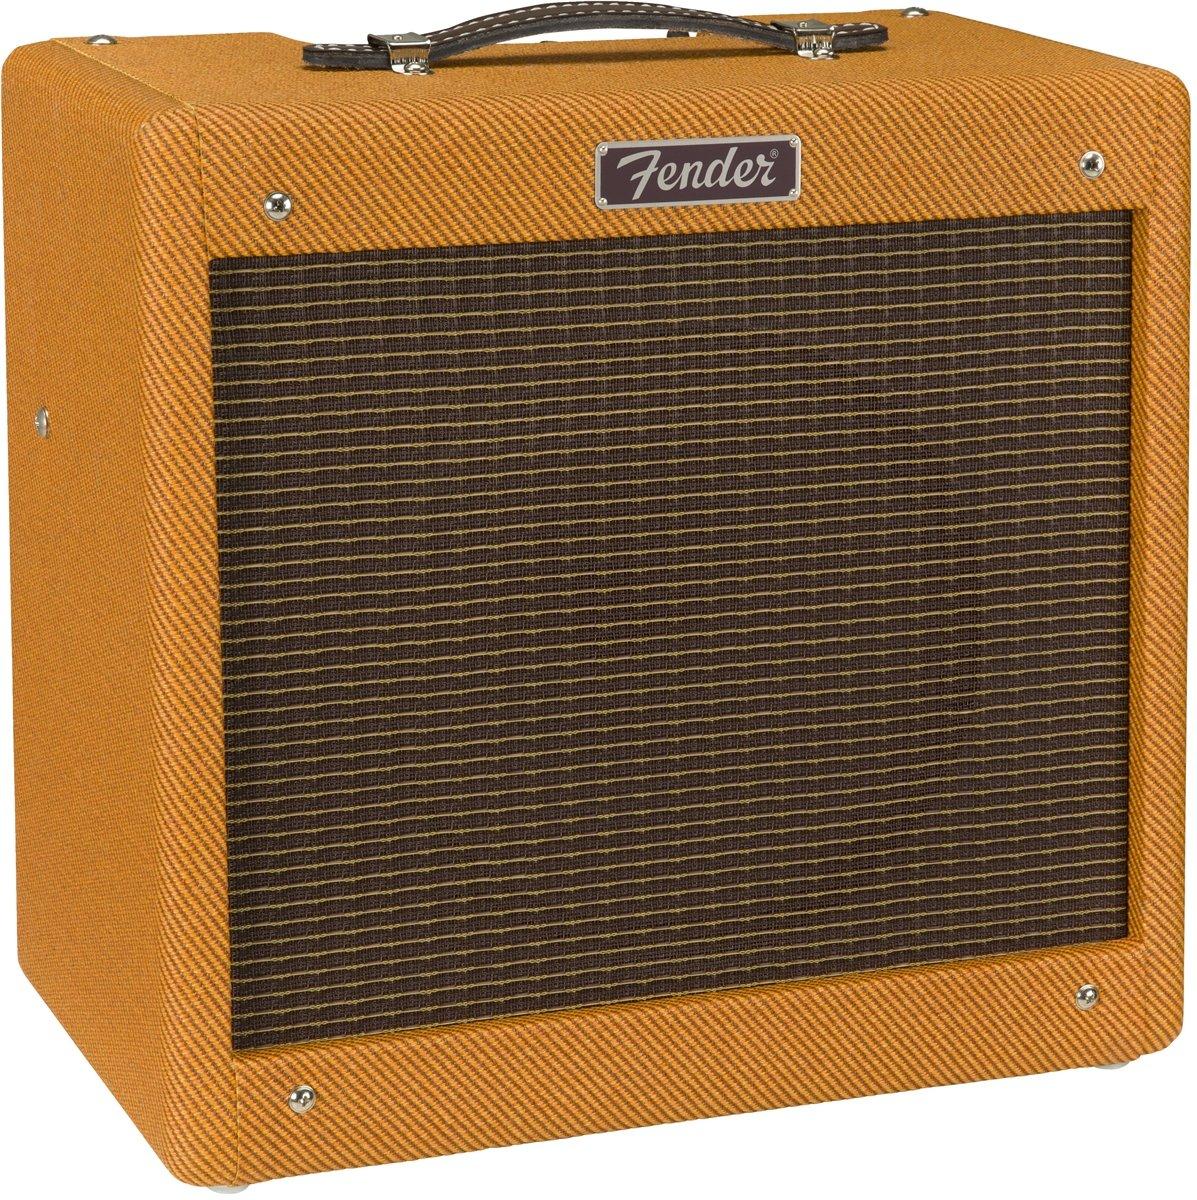 Fender Pro Junior IV 15 Watt Electric Guitar Amplifier by Fender (Image #3)